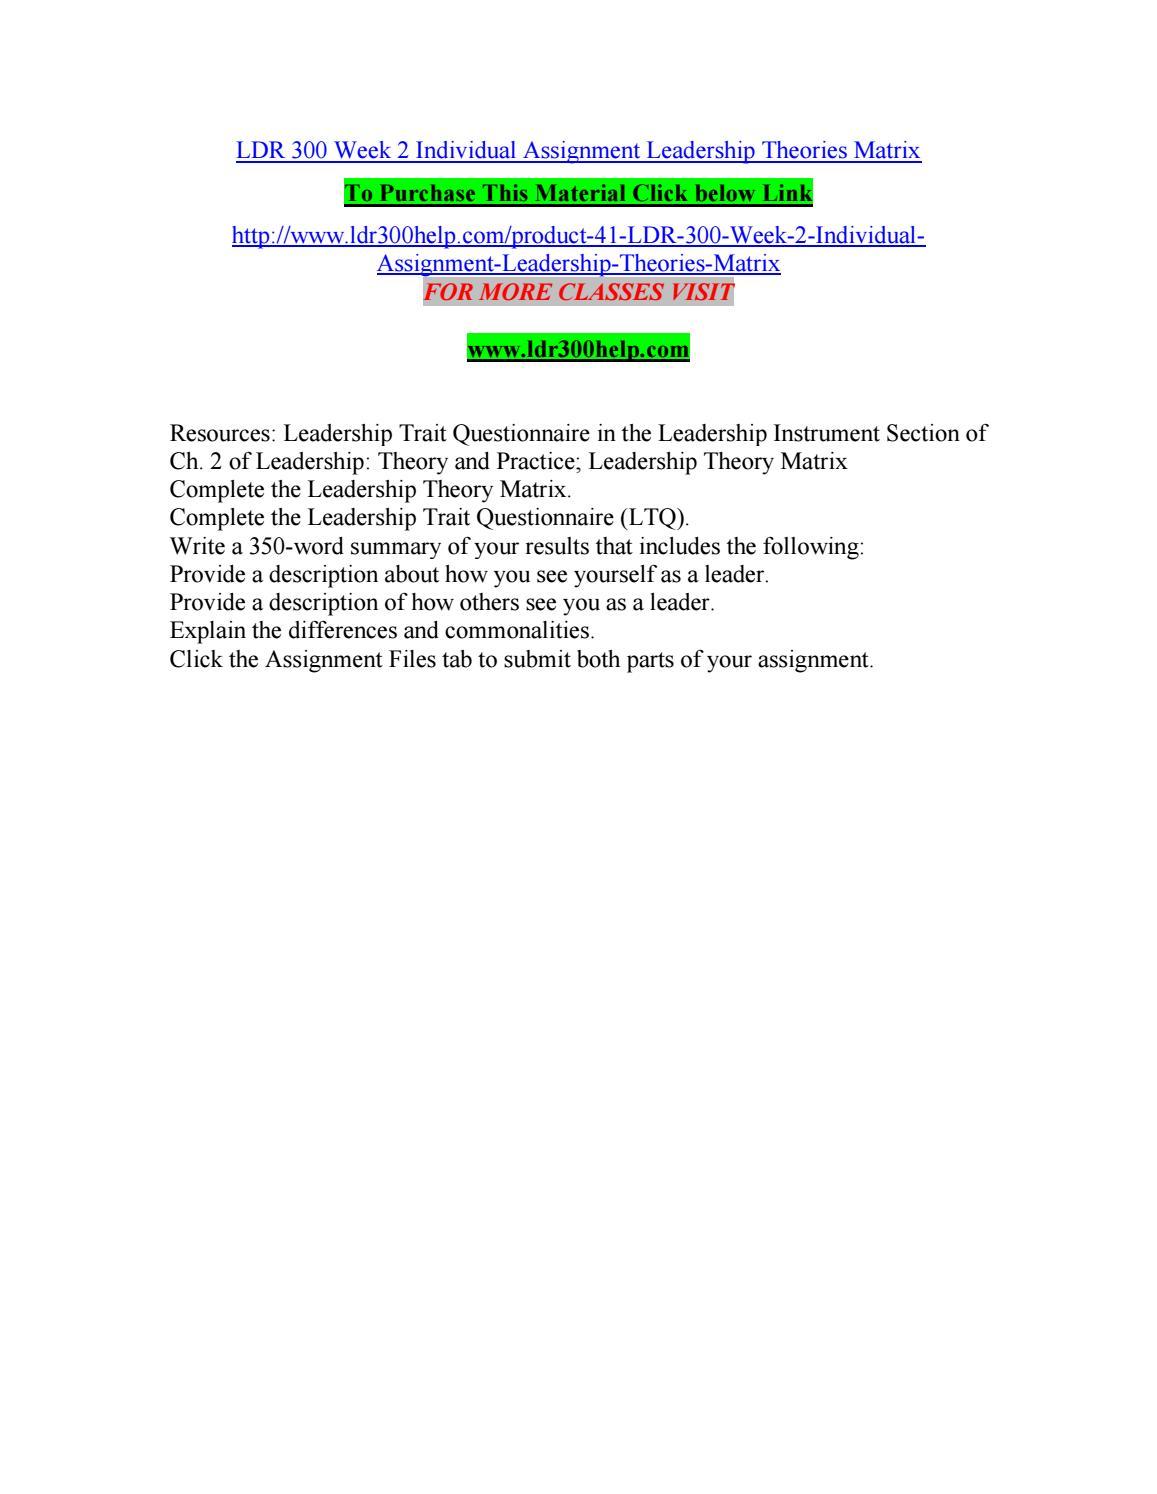 ldr 300 week 3 assignment leadership